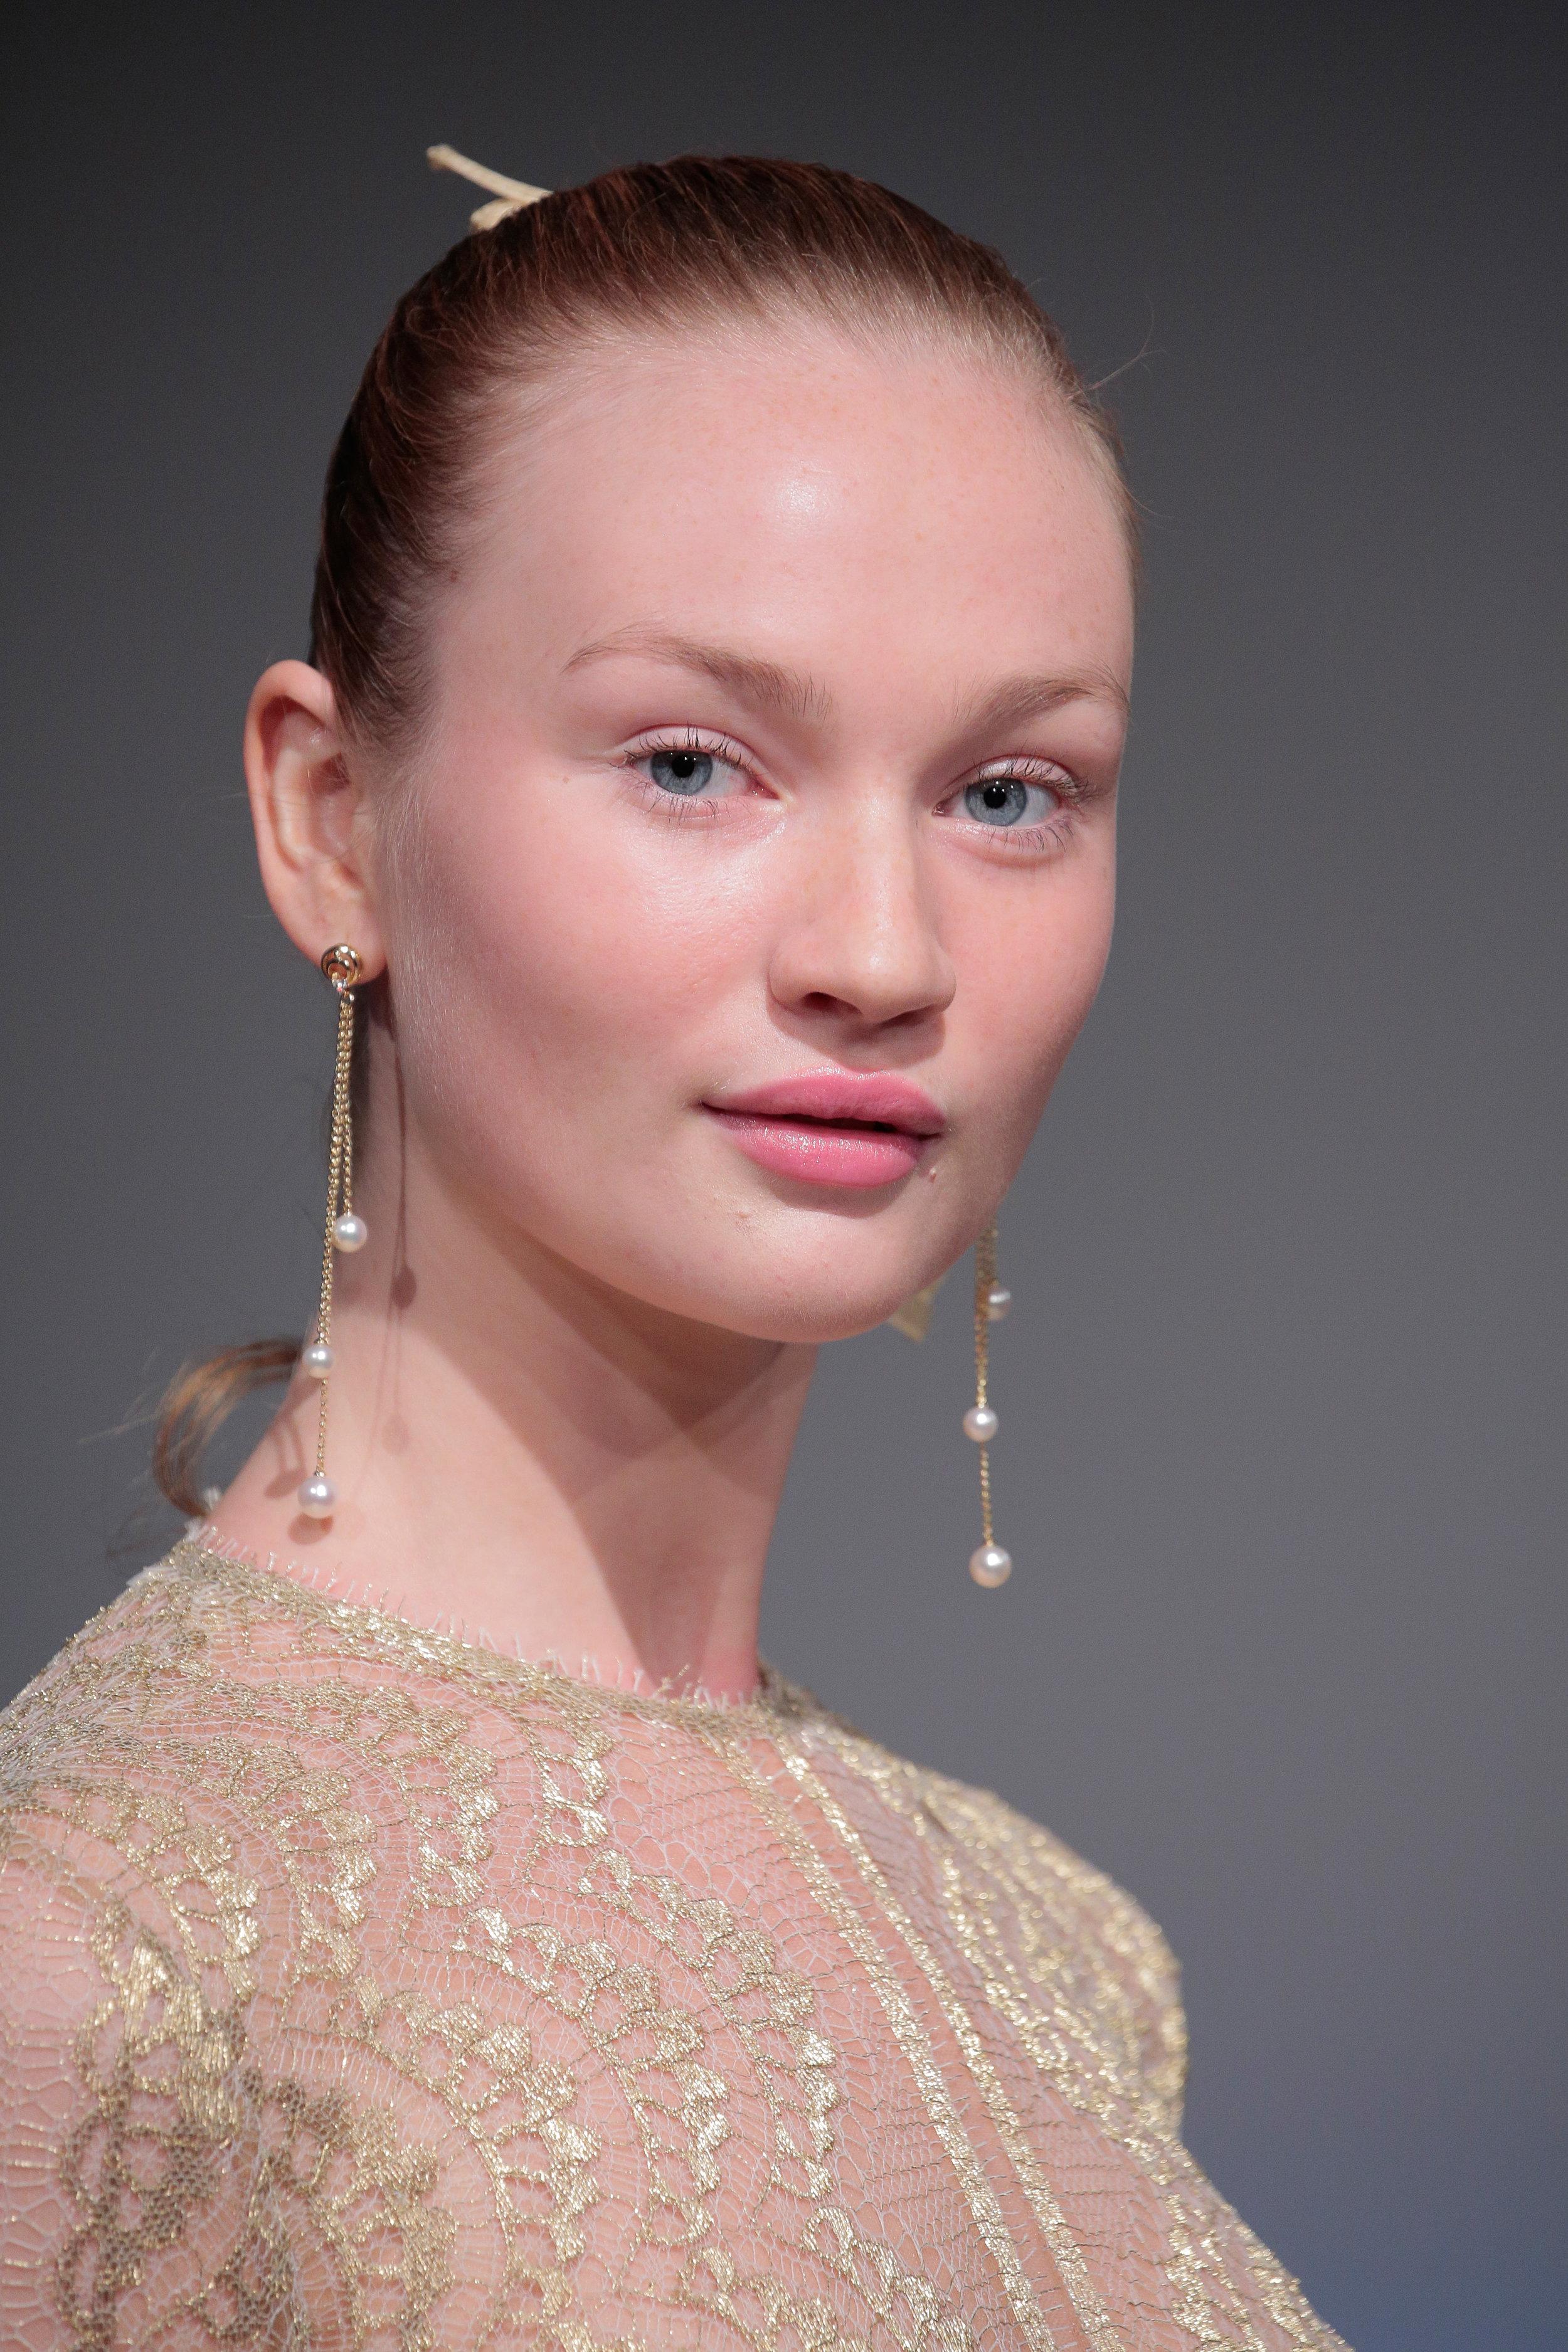 Florence close-up